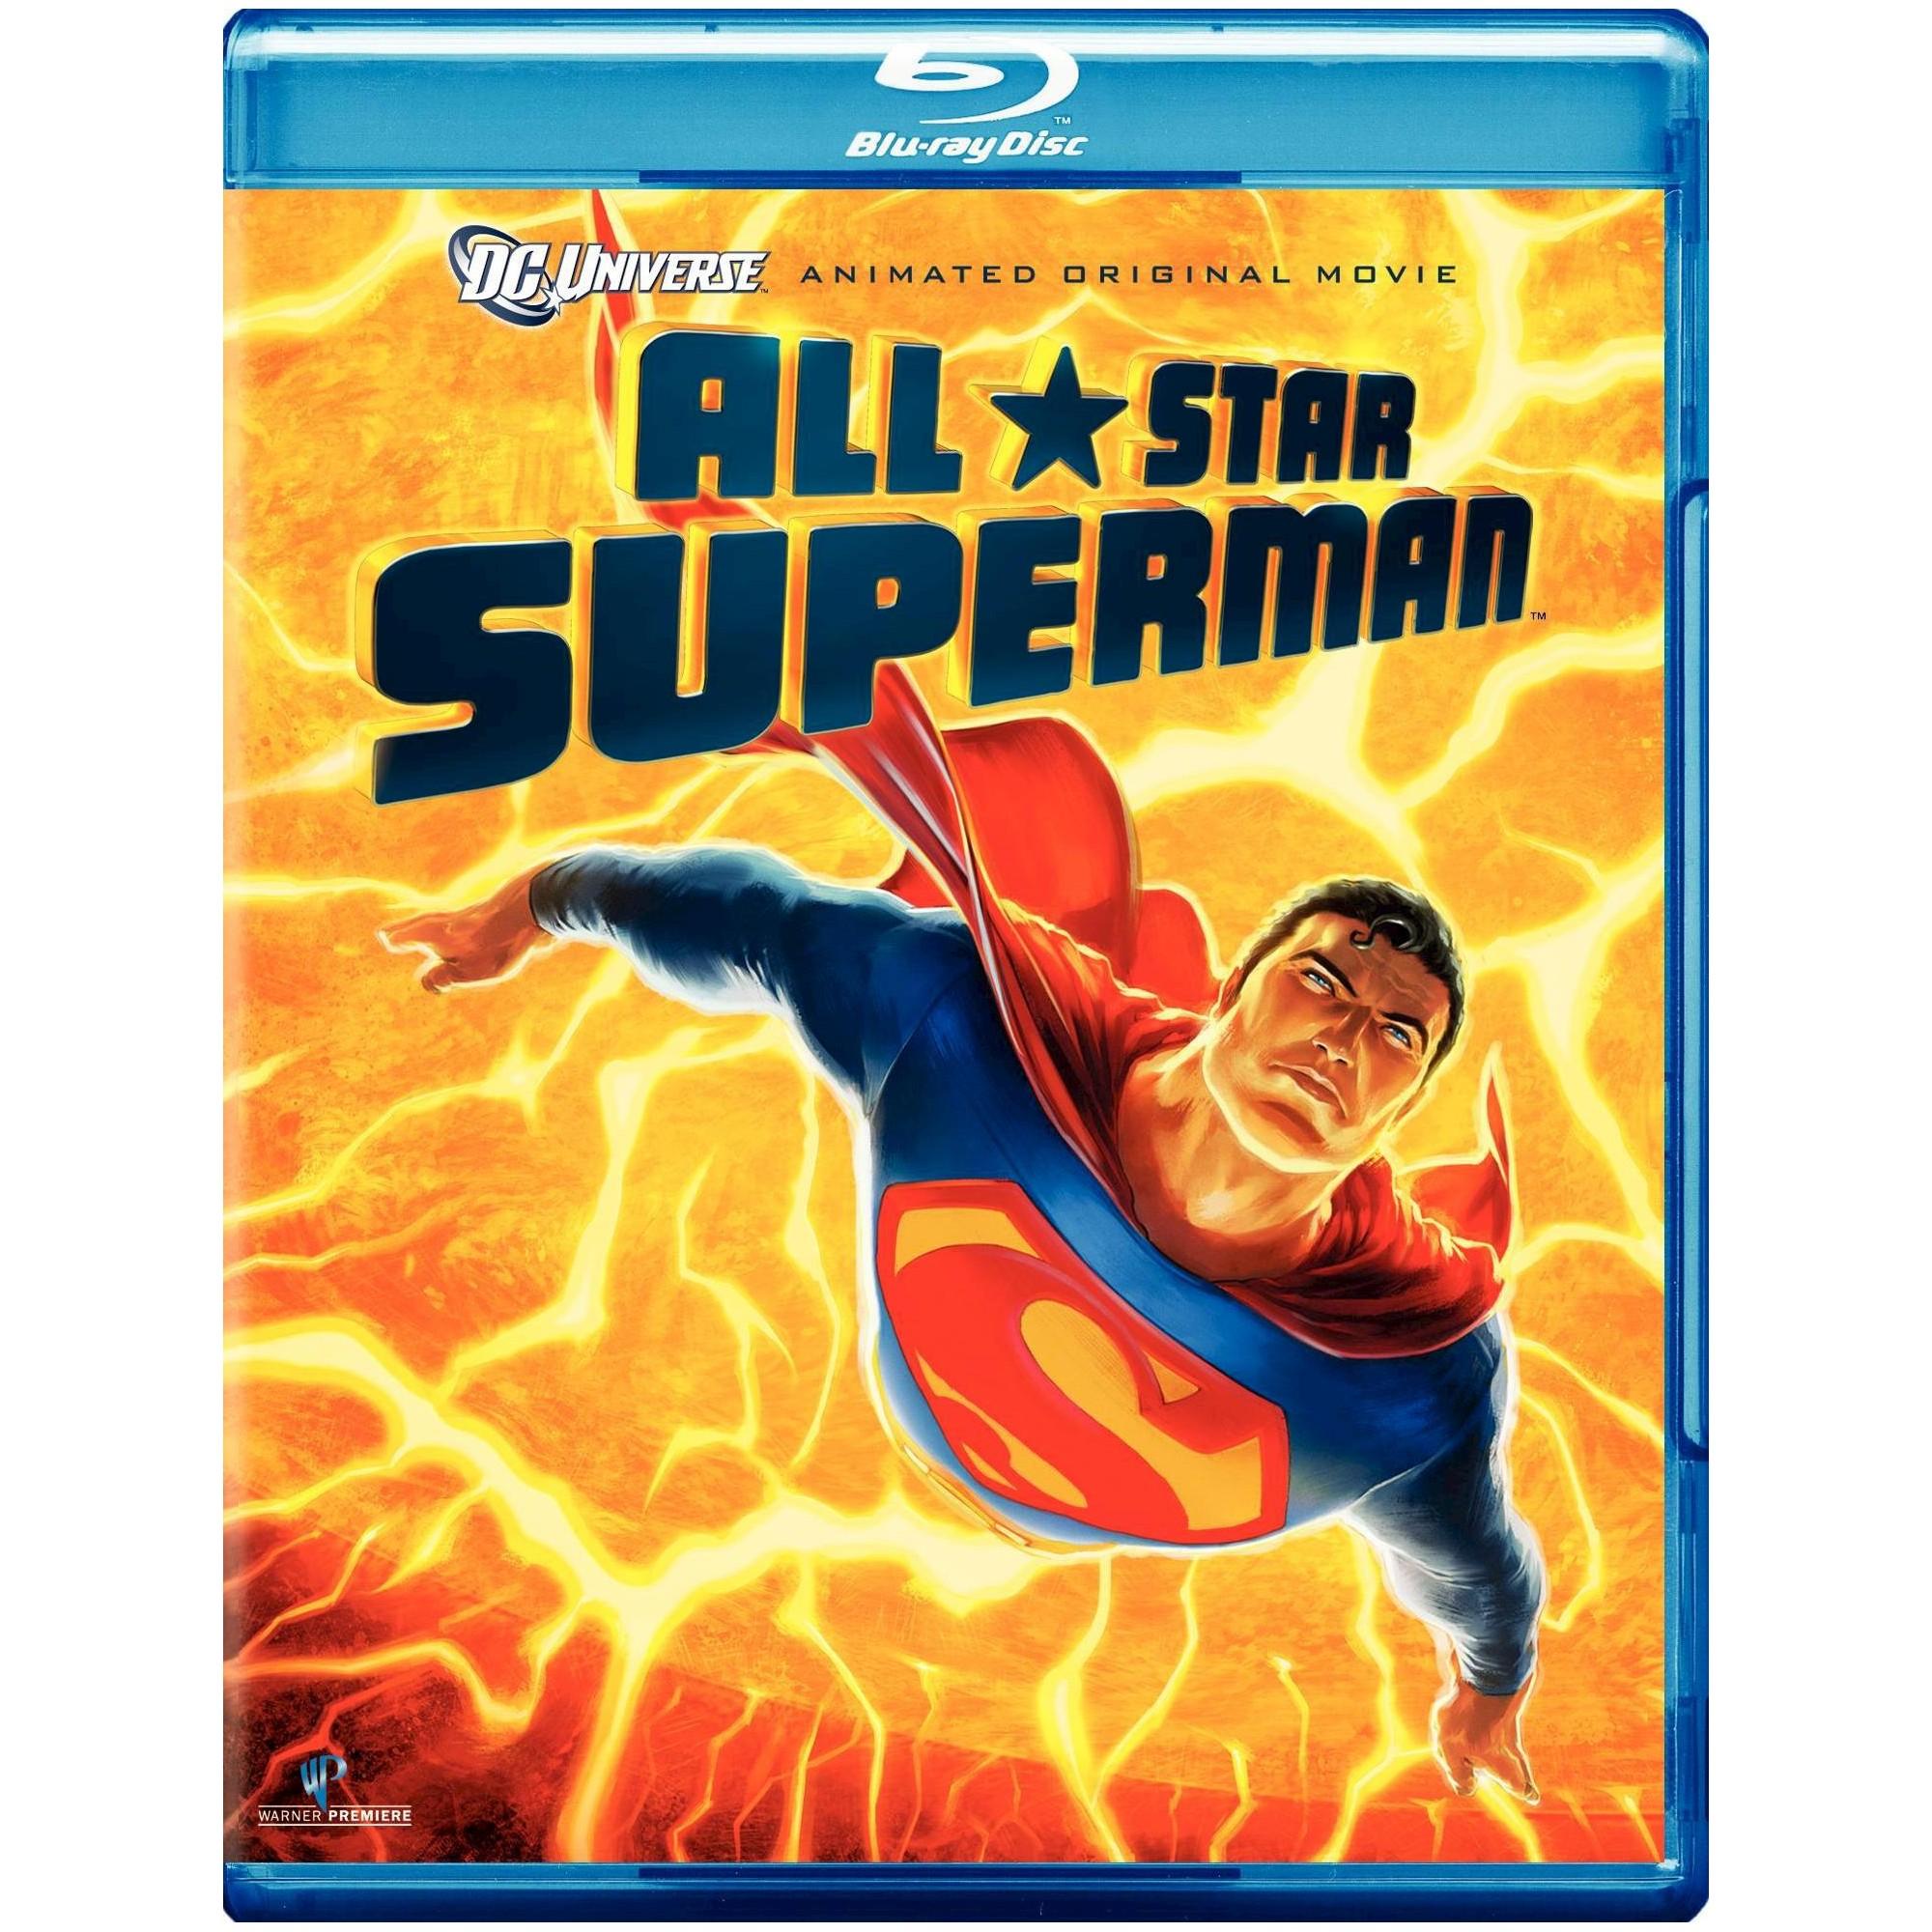 AllStar Superman (2 Discs) (Bluray/DVD) All star